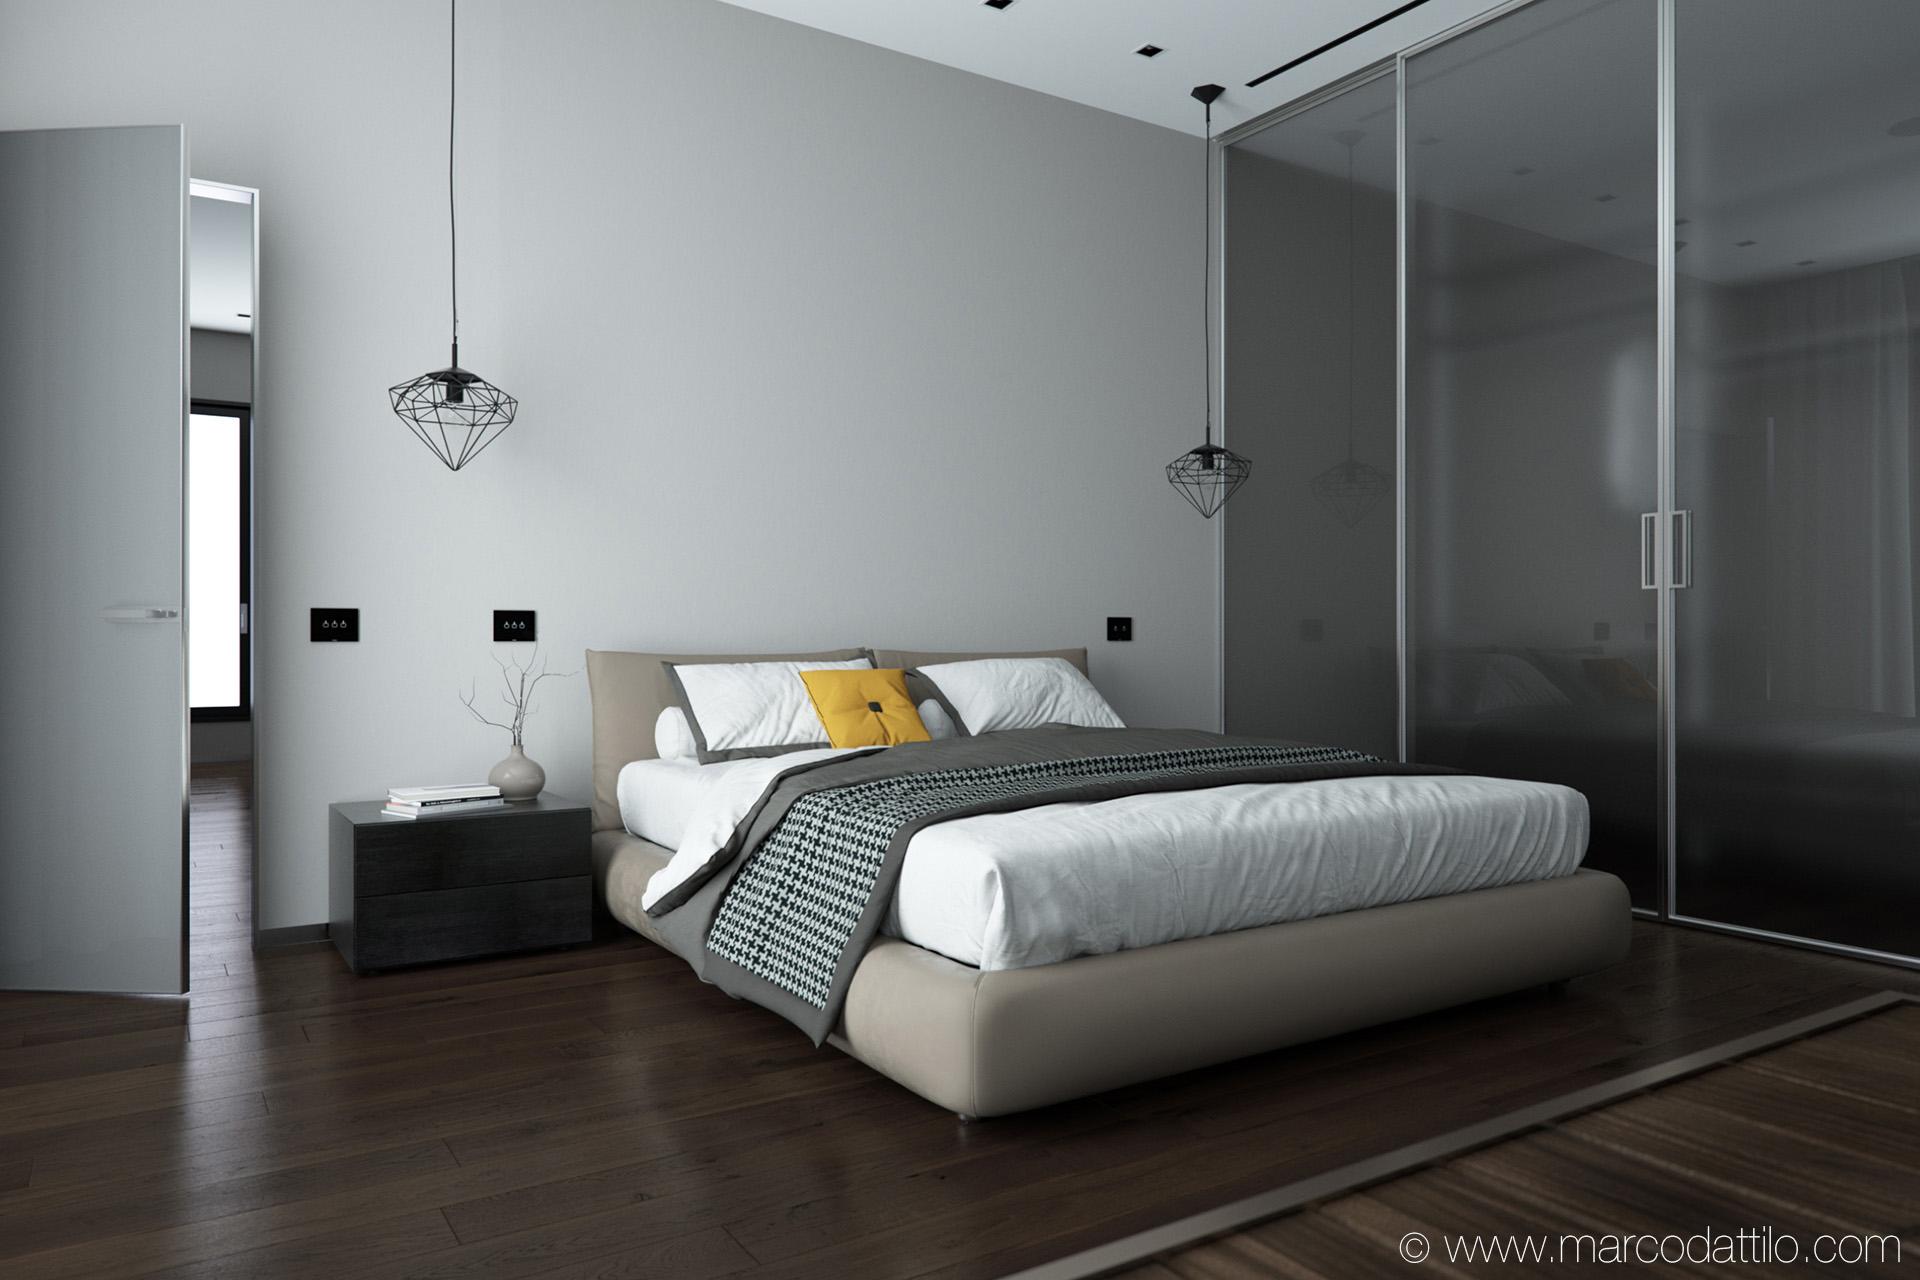 16_Bedroom 02.jpg